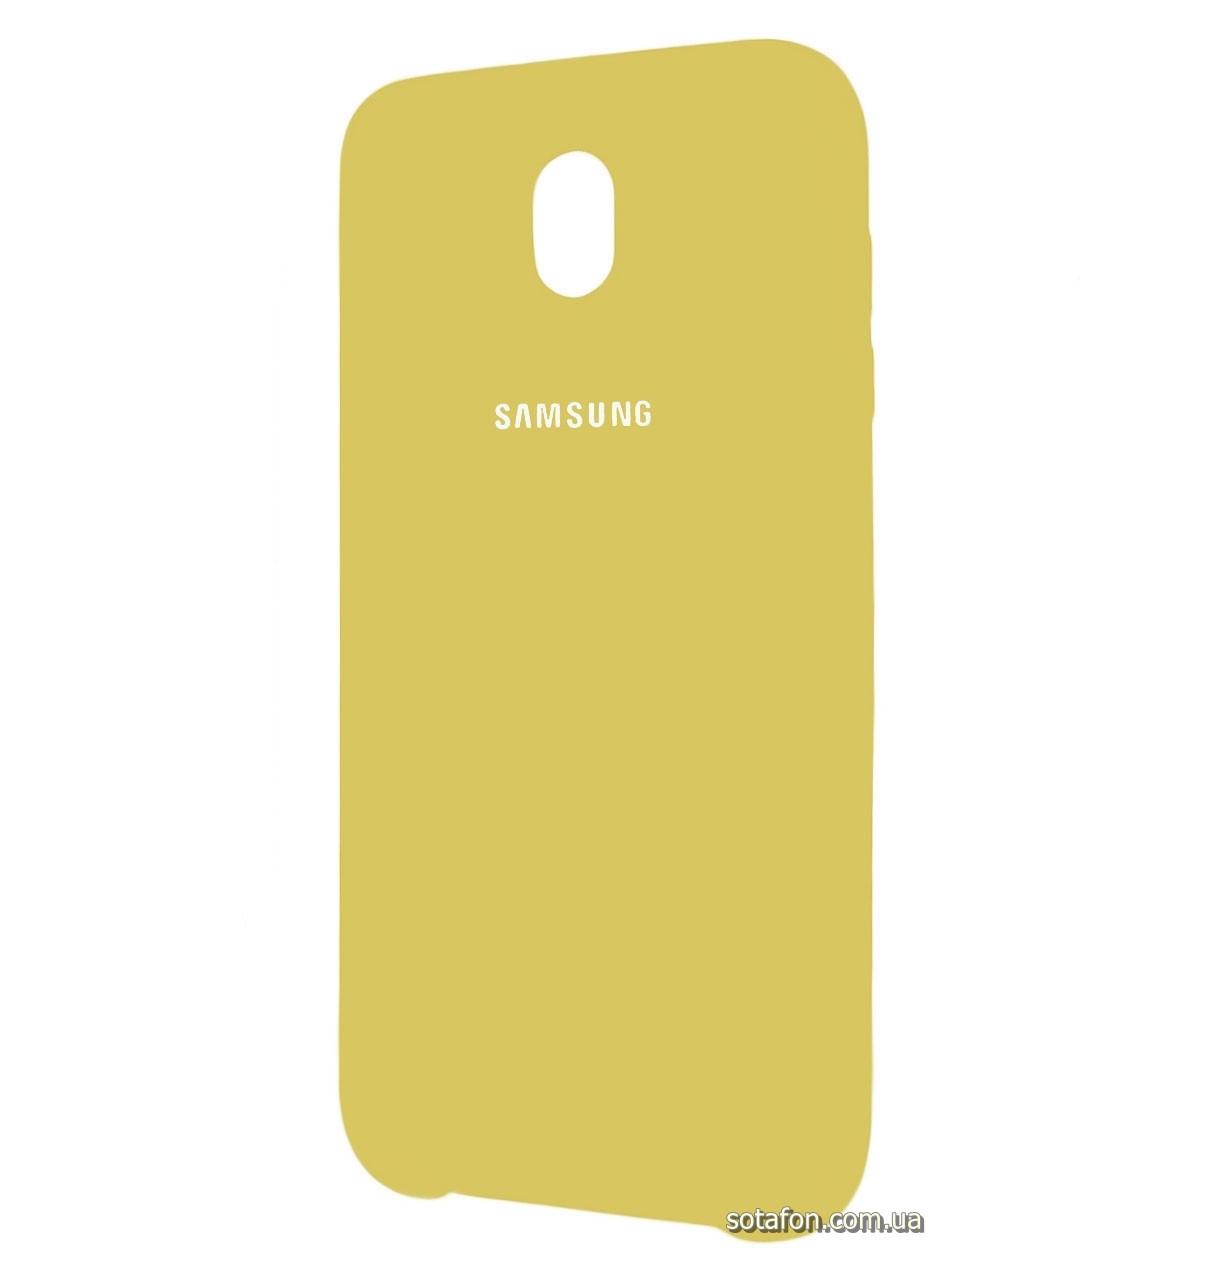 Чехол-накладка Original Silicone case на Samsung Galaxy J7 (2017) SM-J730F Champagne Gold